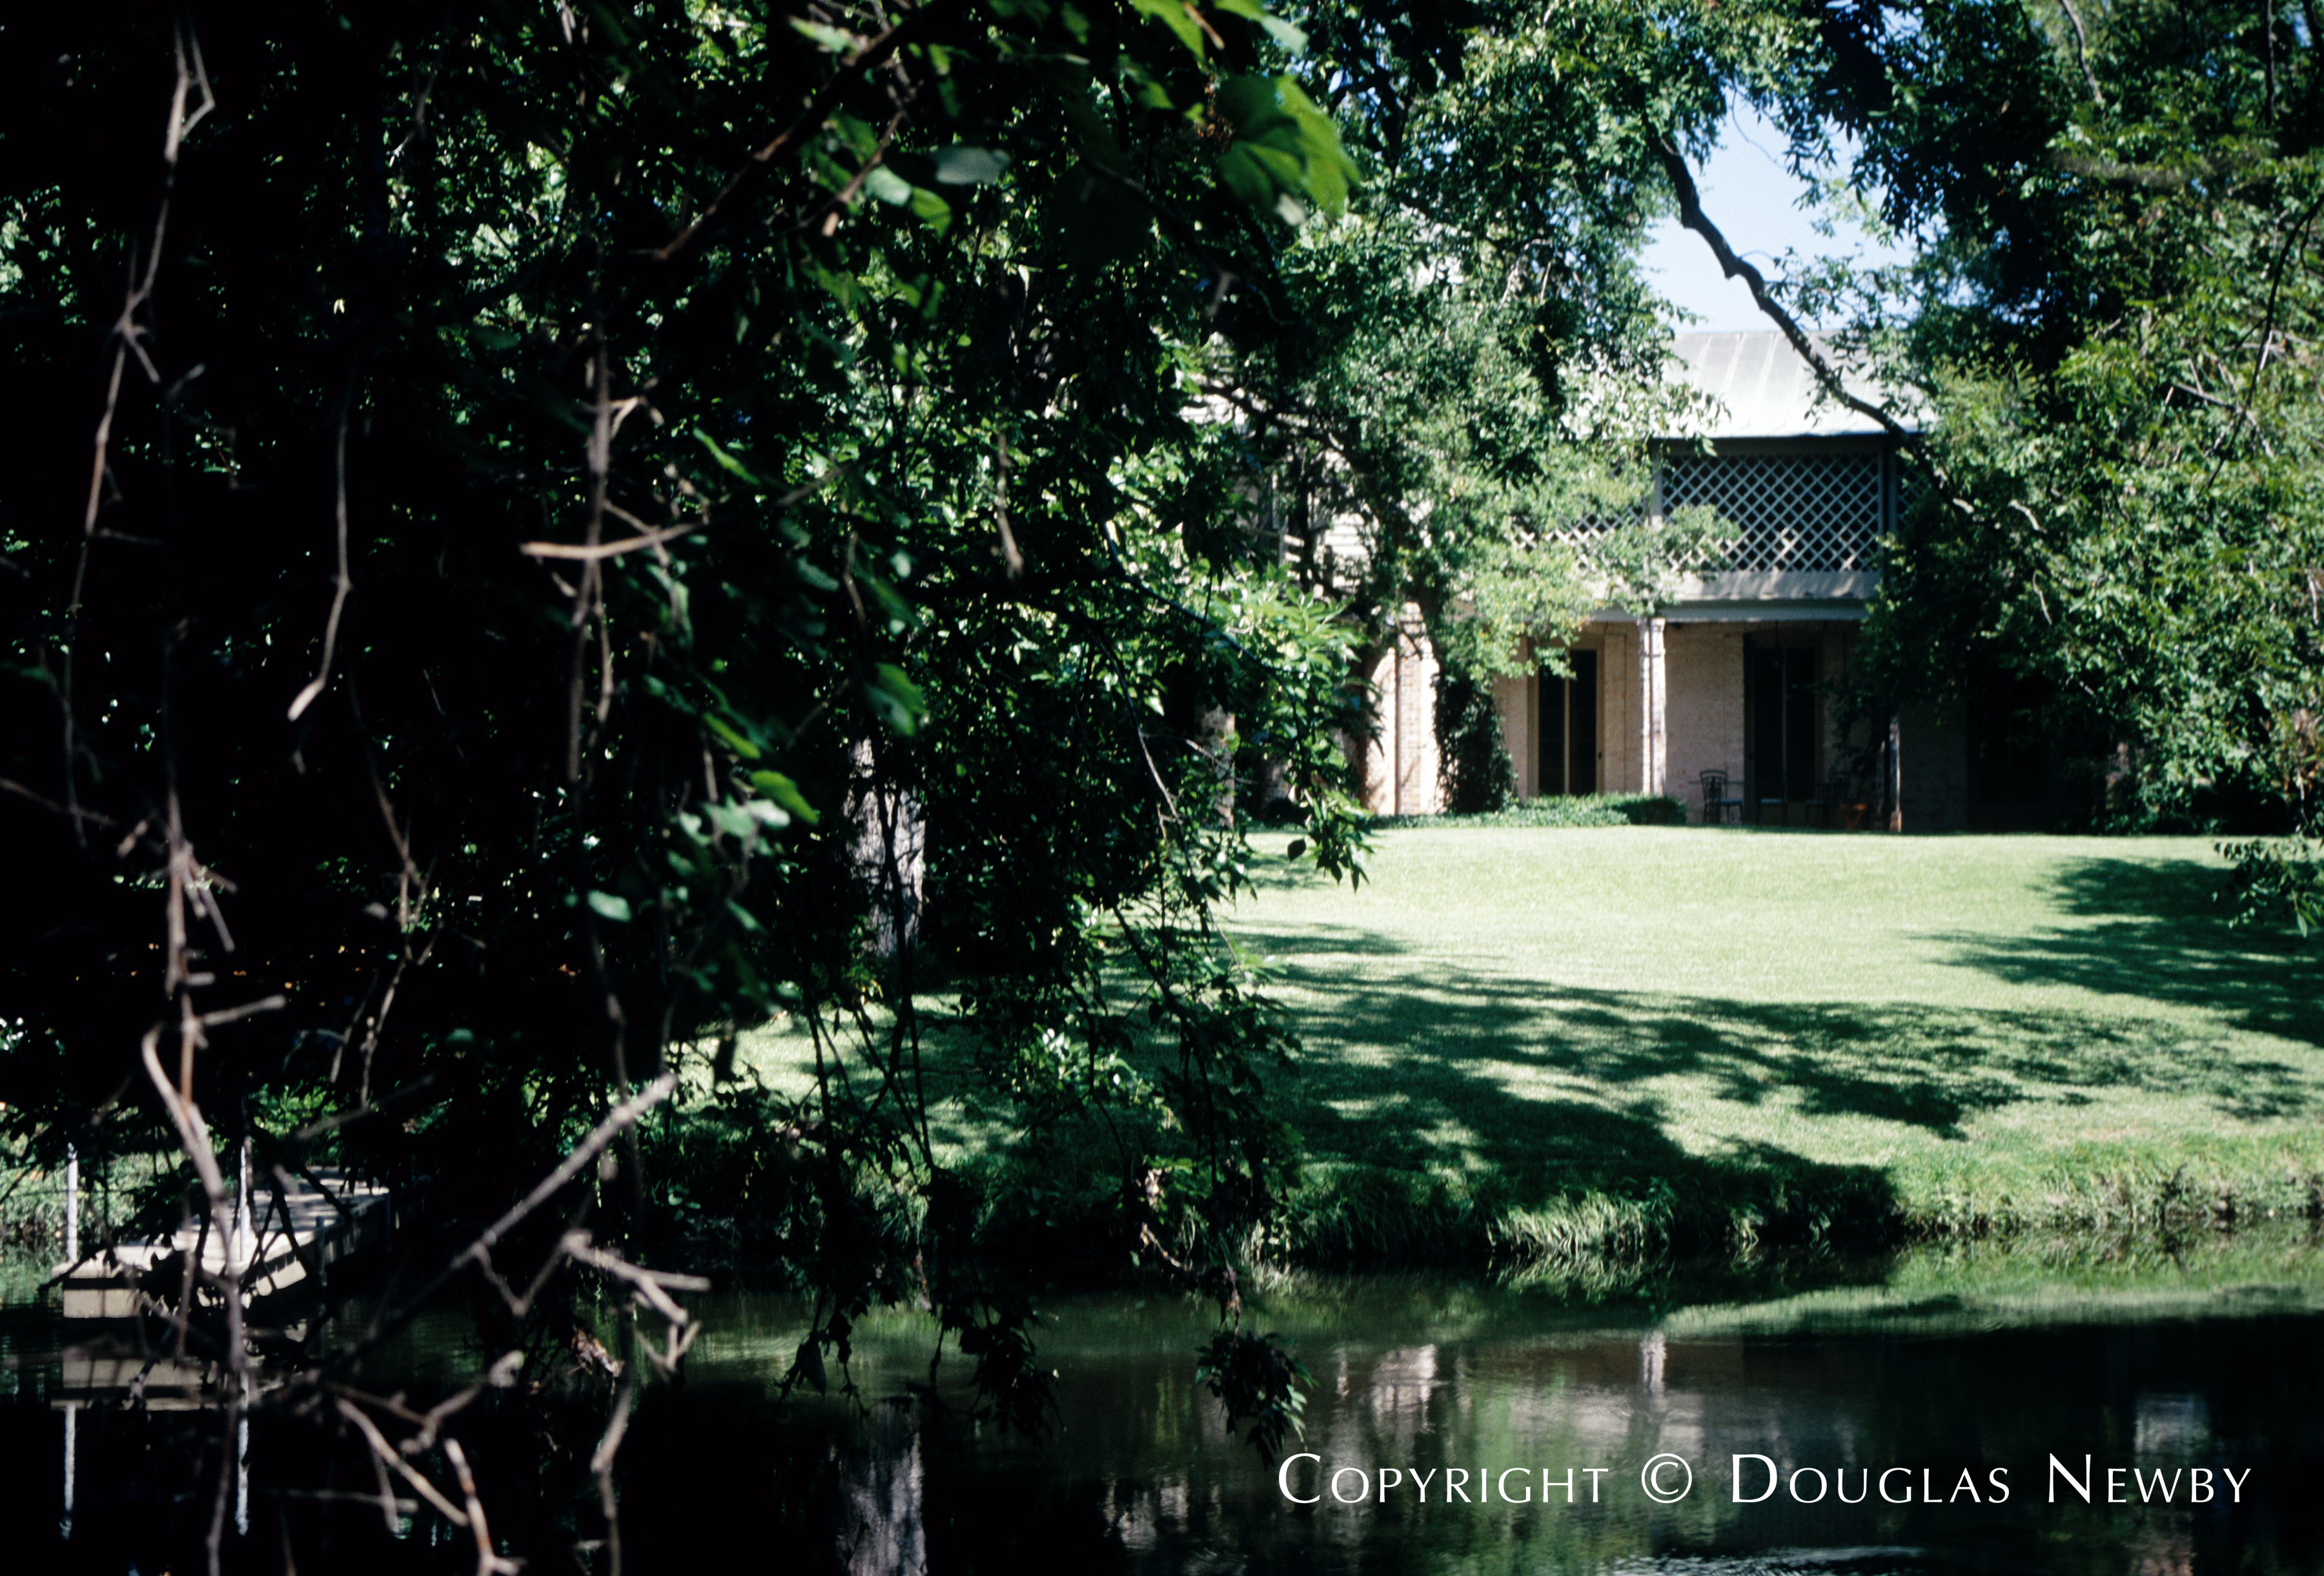 Significant Home on McFarlin, Dallas, Texas